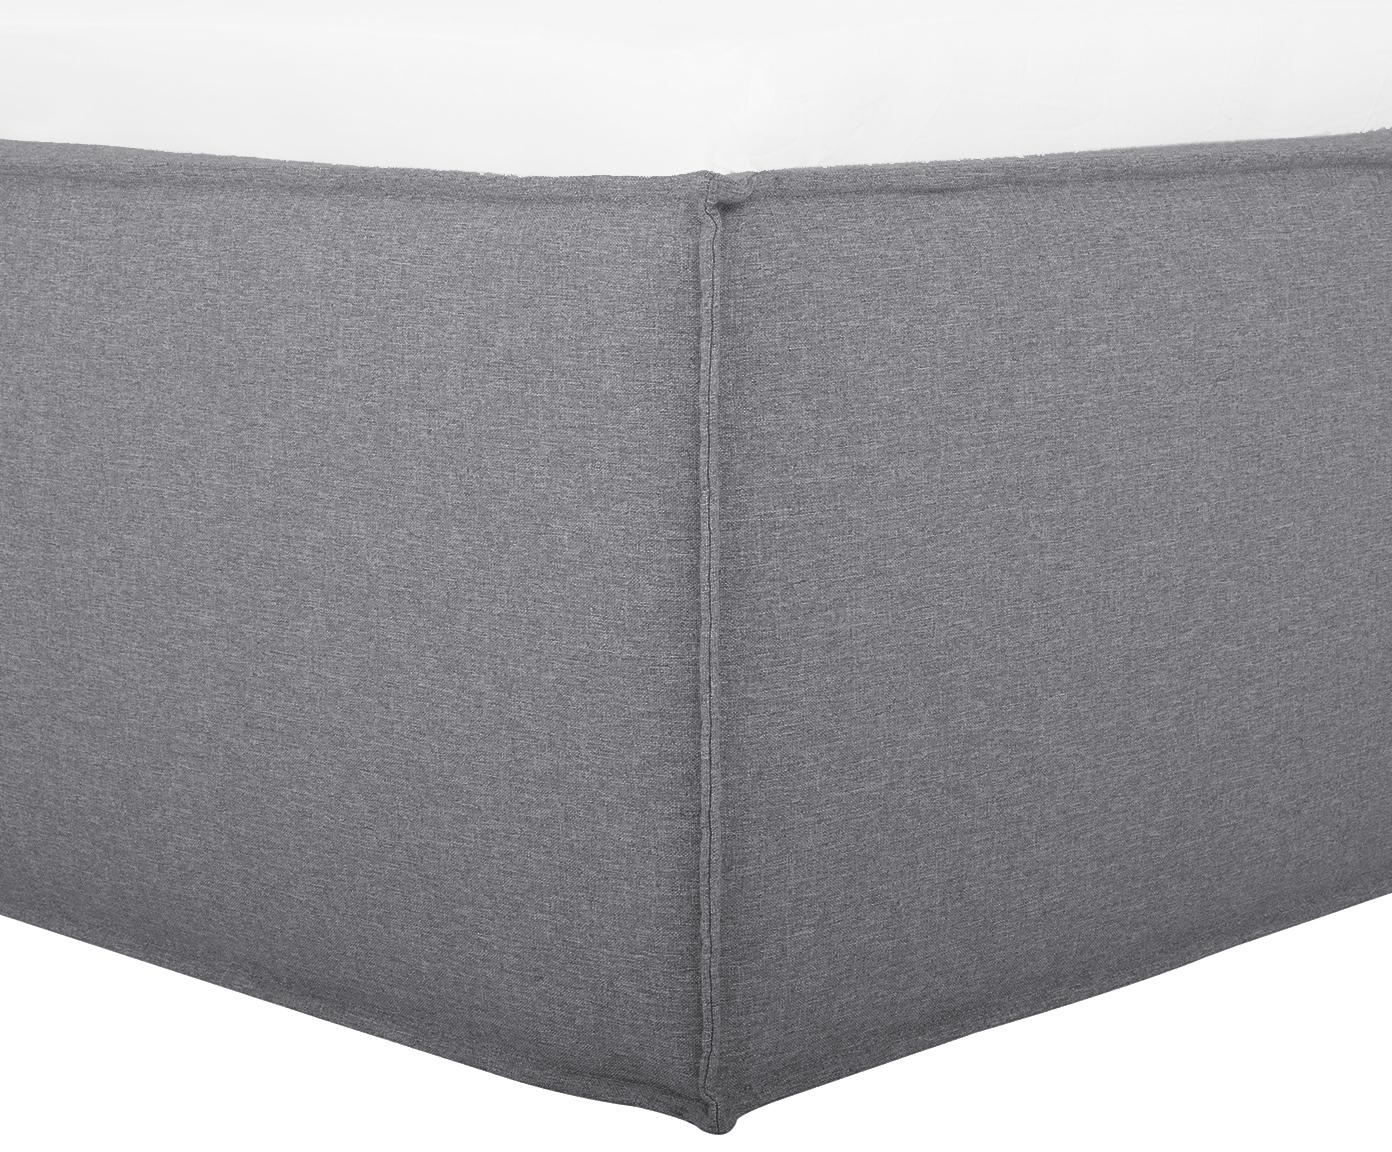 Gestoffeerd bed Dream, Frame: massief grenenhout, Bekleding: polyester (structuurmater, Grijs, 140 x 200 cm